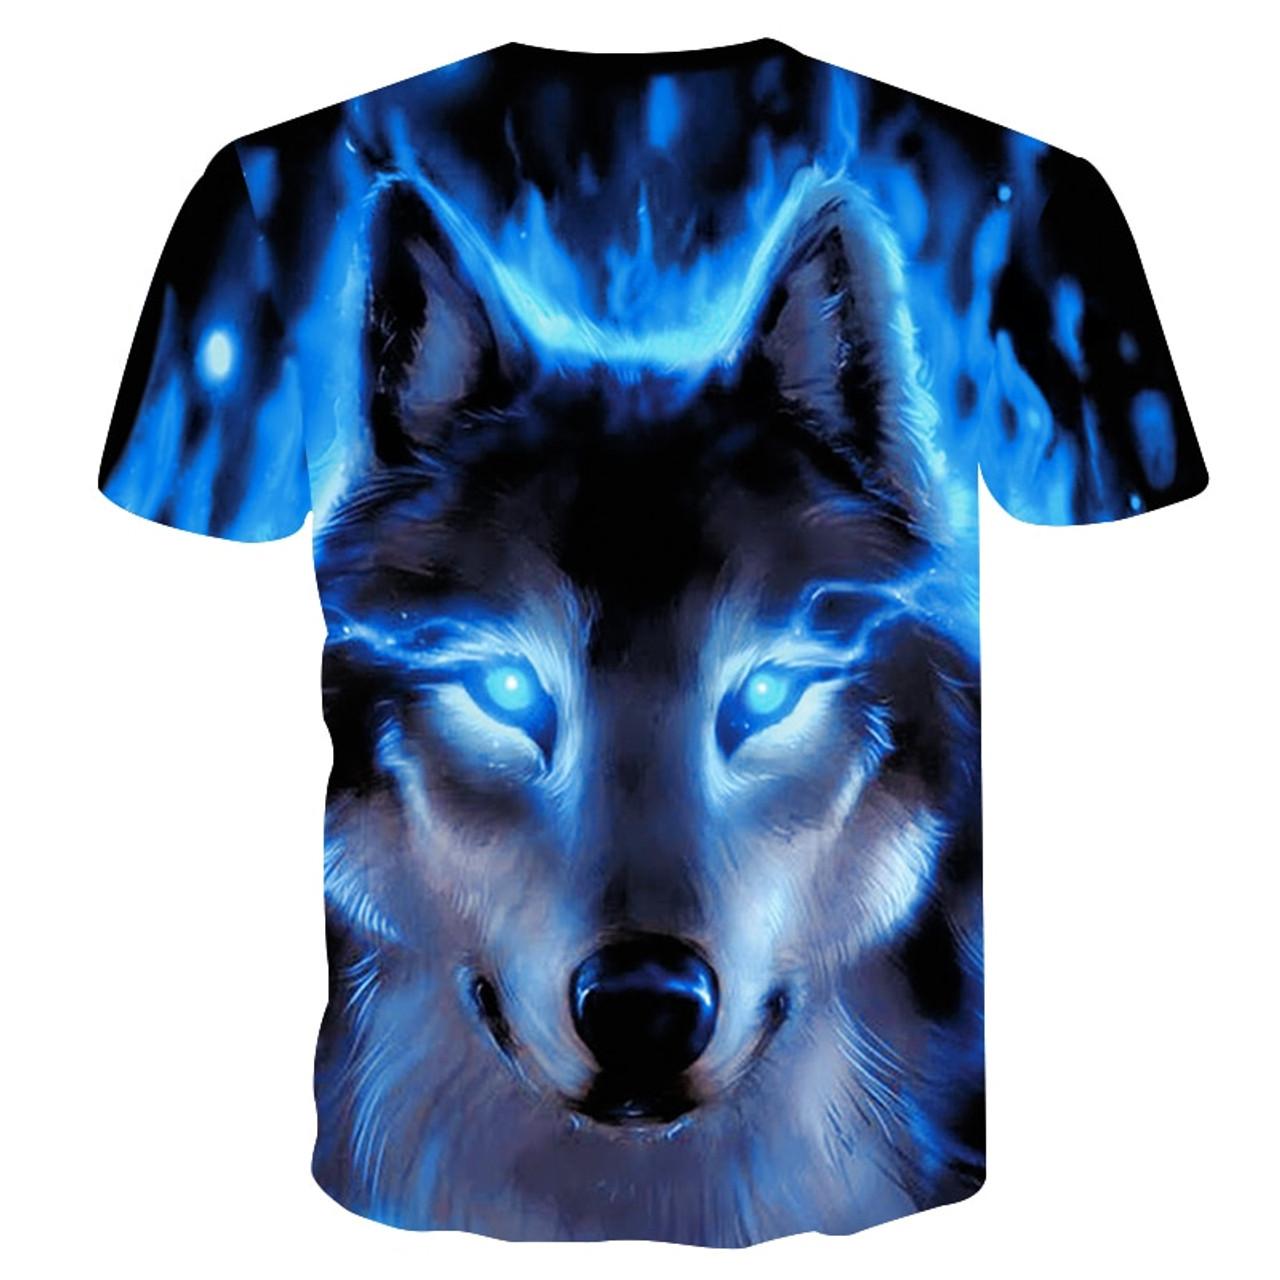 d388cf08 ... 2018 Newest Wolf 3D Print Animal Cool Funny T-Shirt Men Short Sleeve  Summer Tops ...